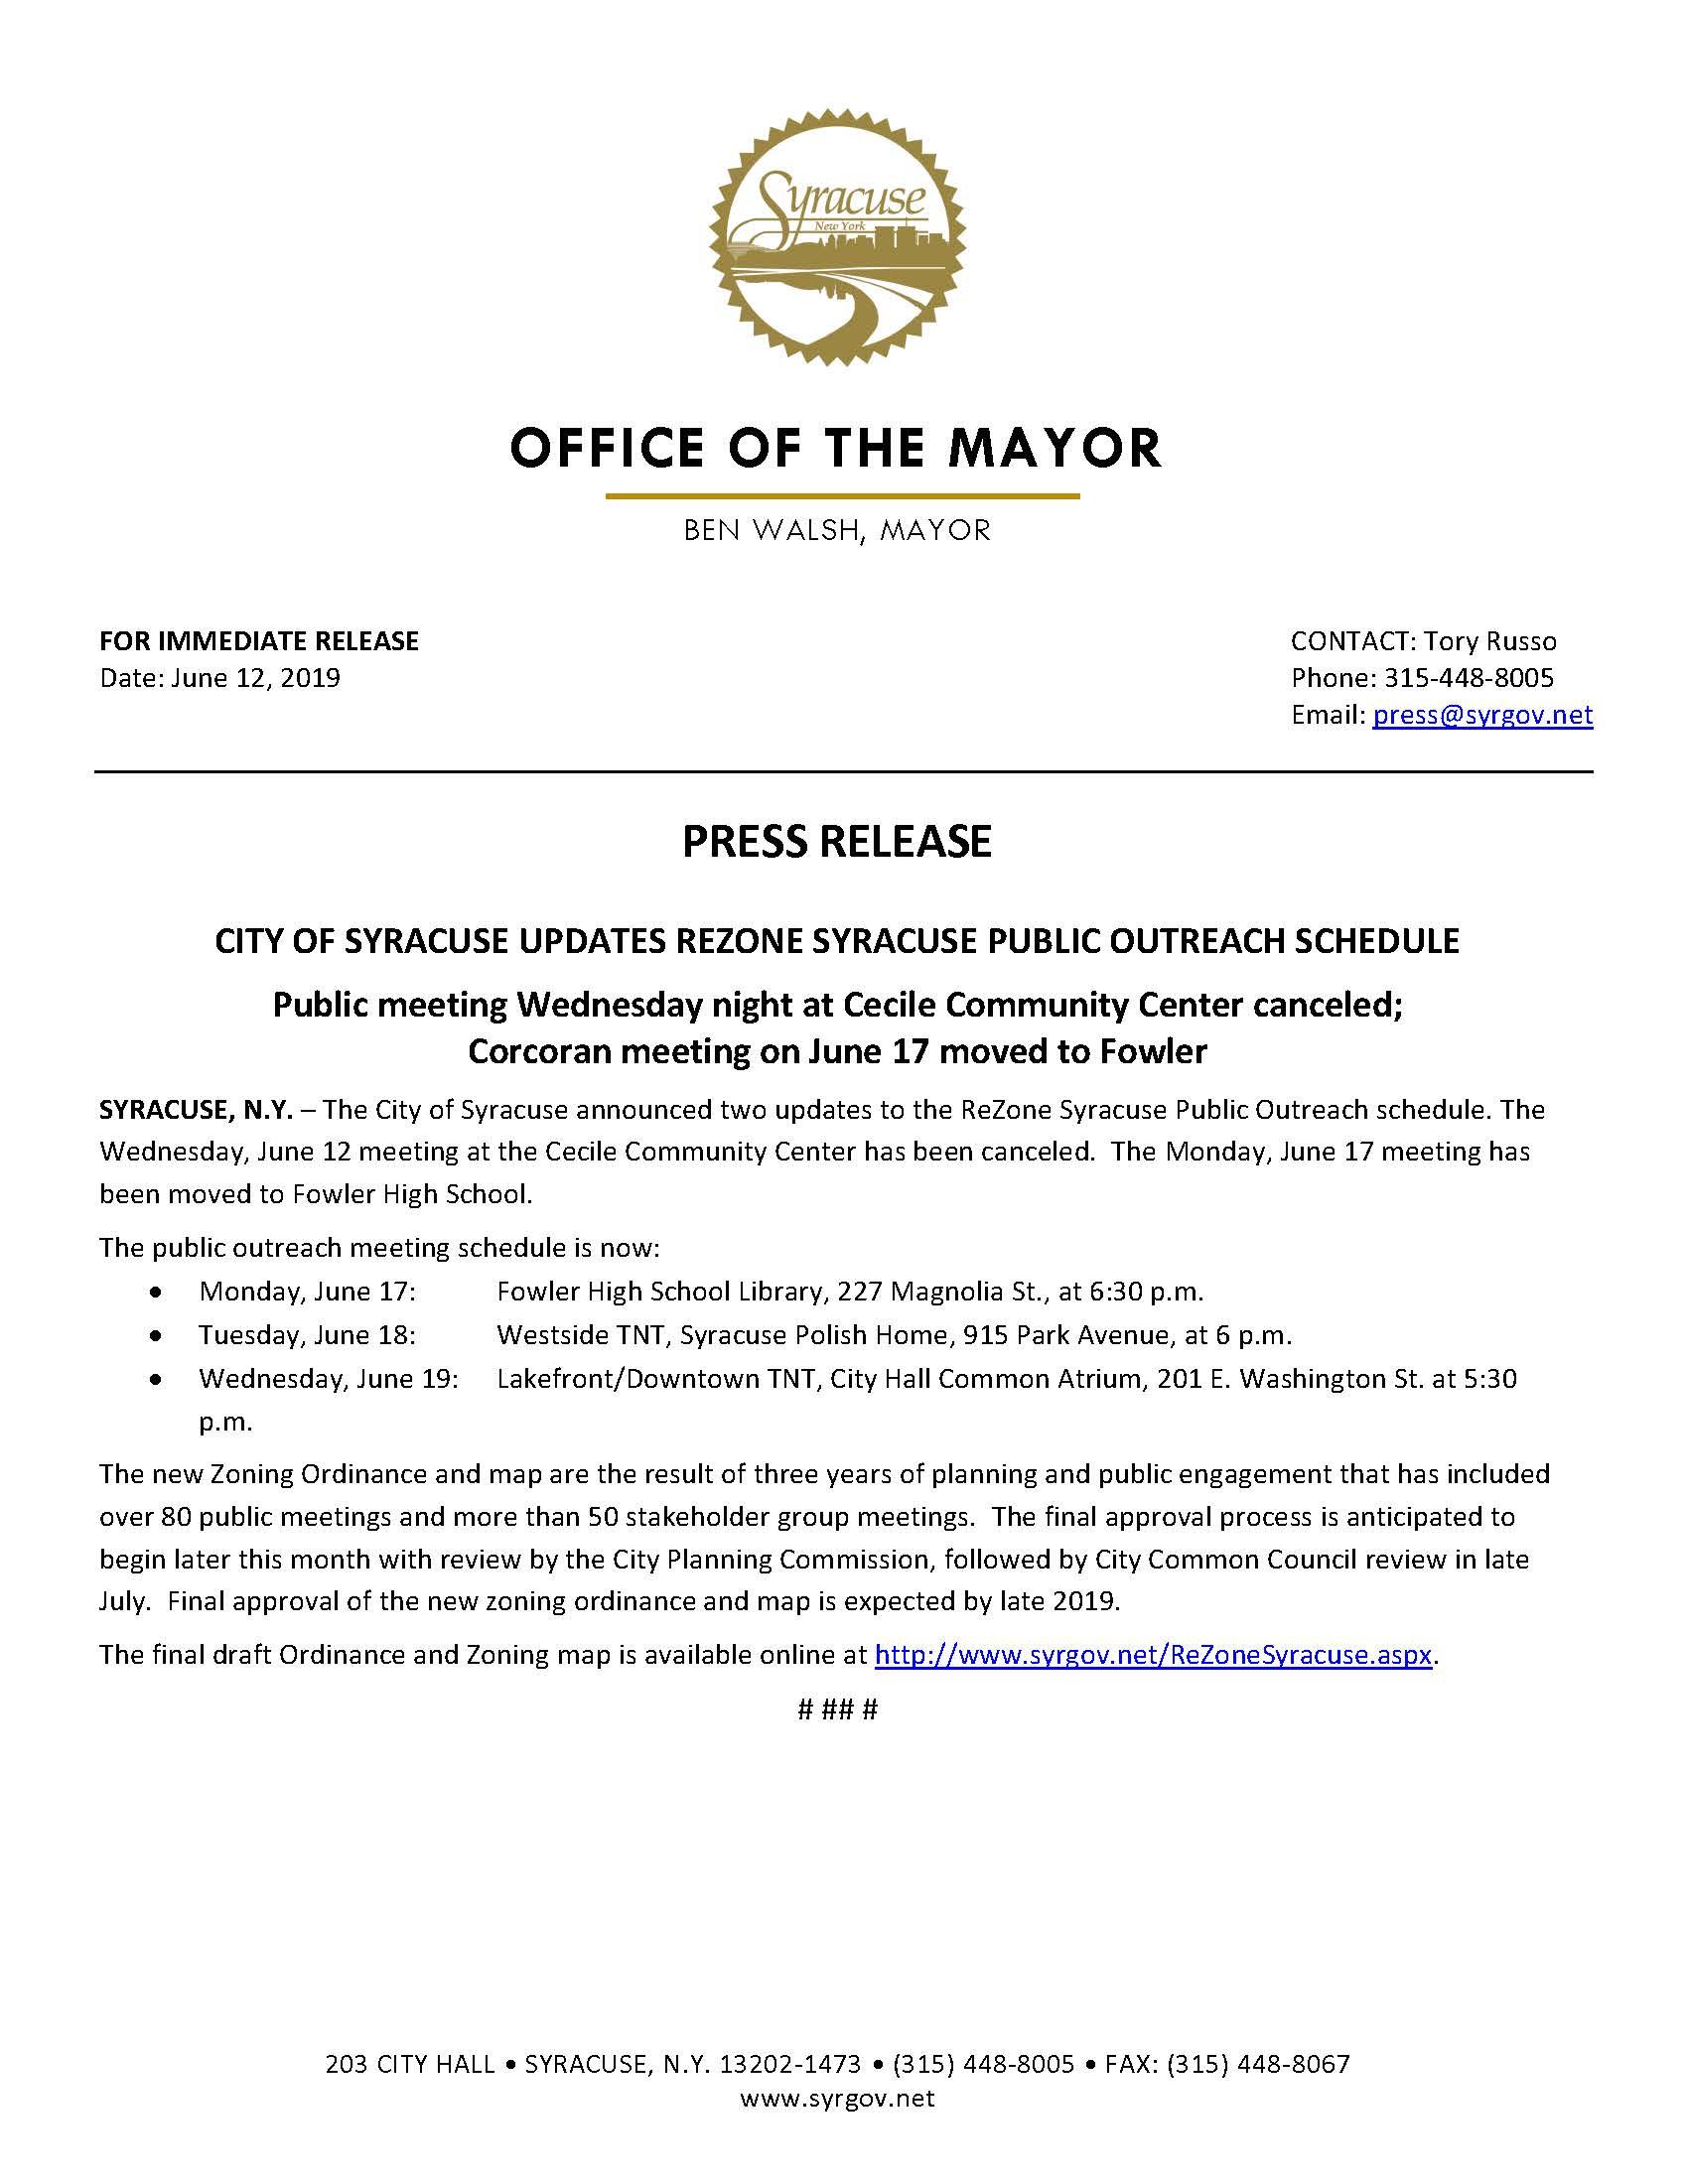 2019 06 12 PRESS RELEASE City of Syracuse Updates ReZone Meeting Schedule.jpg